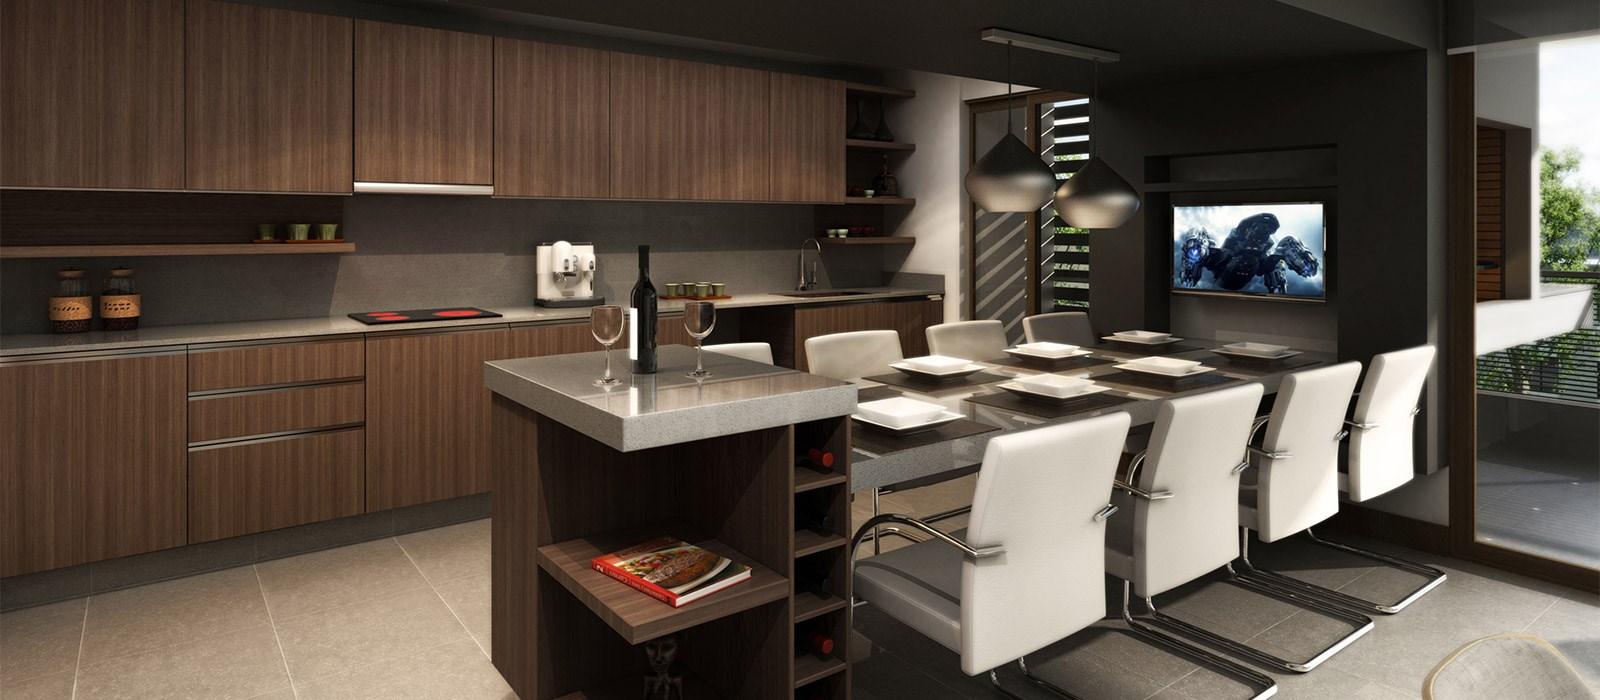 Cocinas integradas jorge matte inmobiliaria aconcagua - Cocinas integradas ...